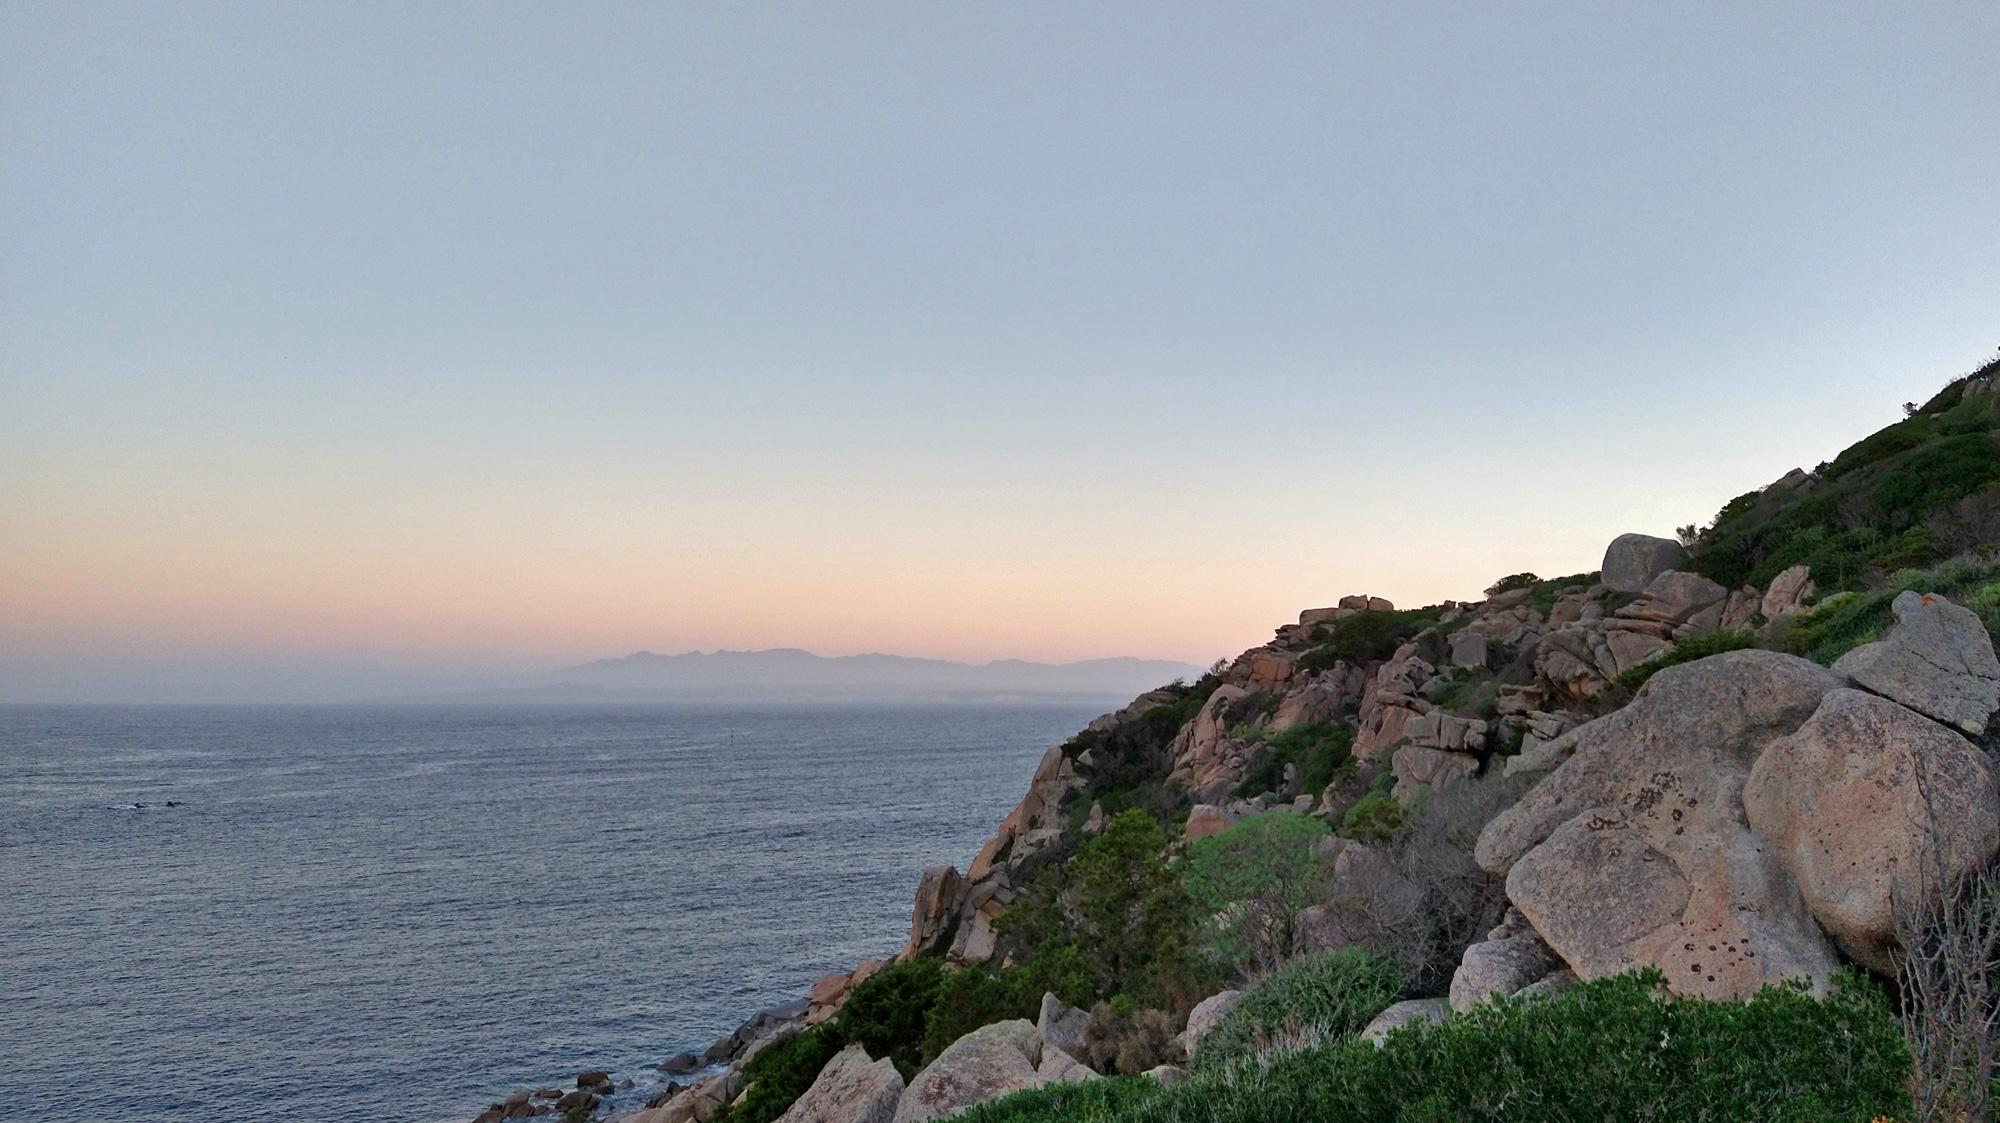 Nebliger Blick in Richtung Korsika